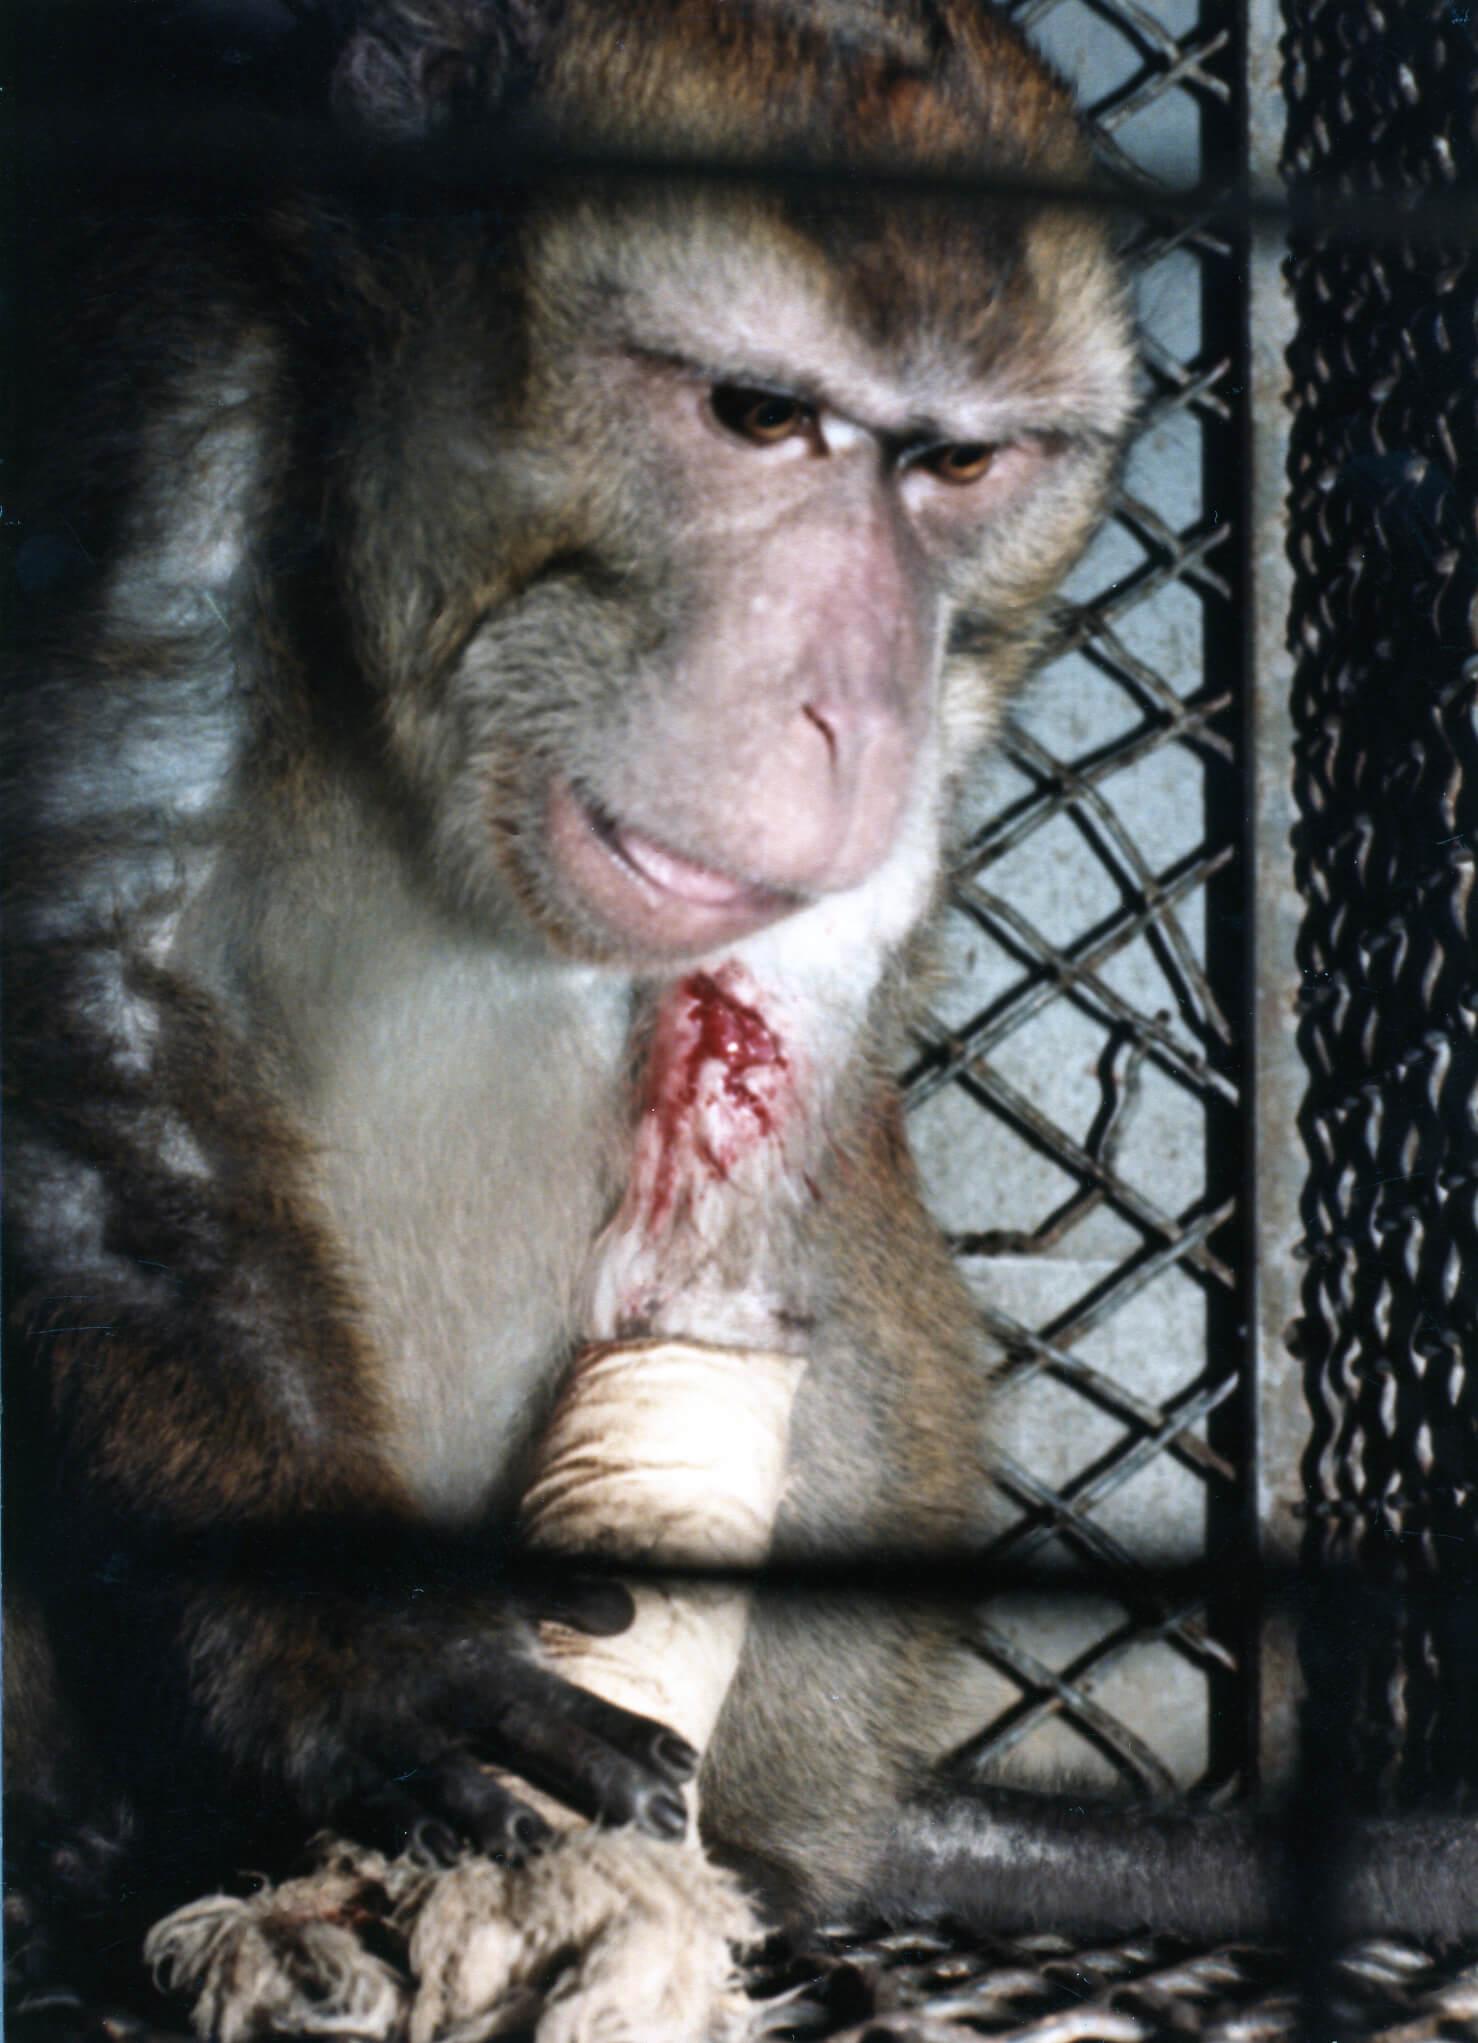 Silver Spring Monkey Case